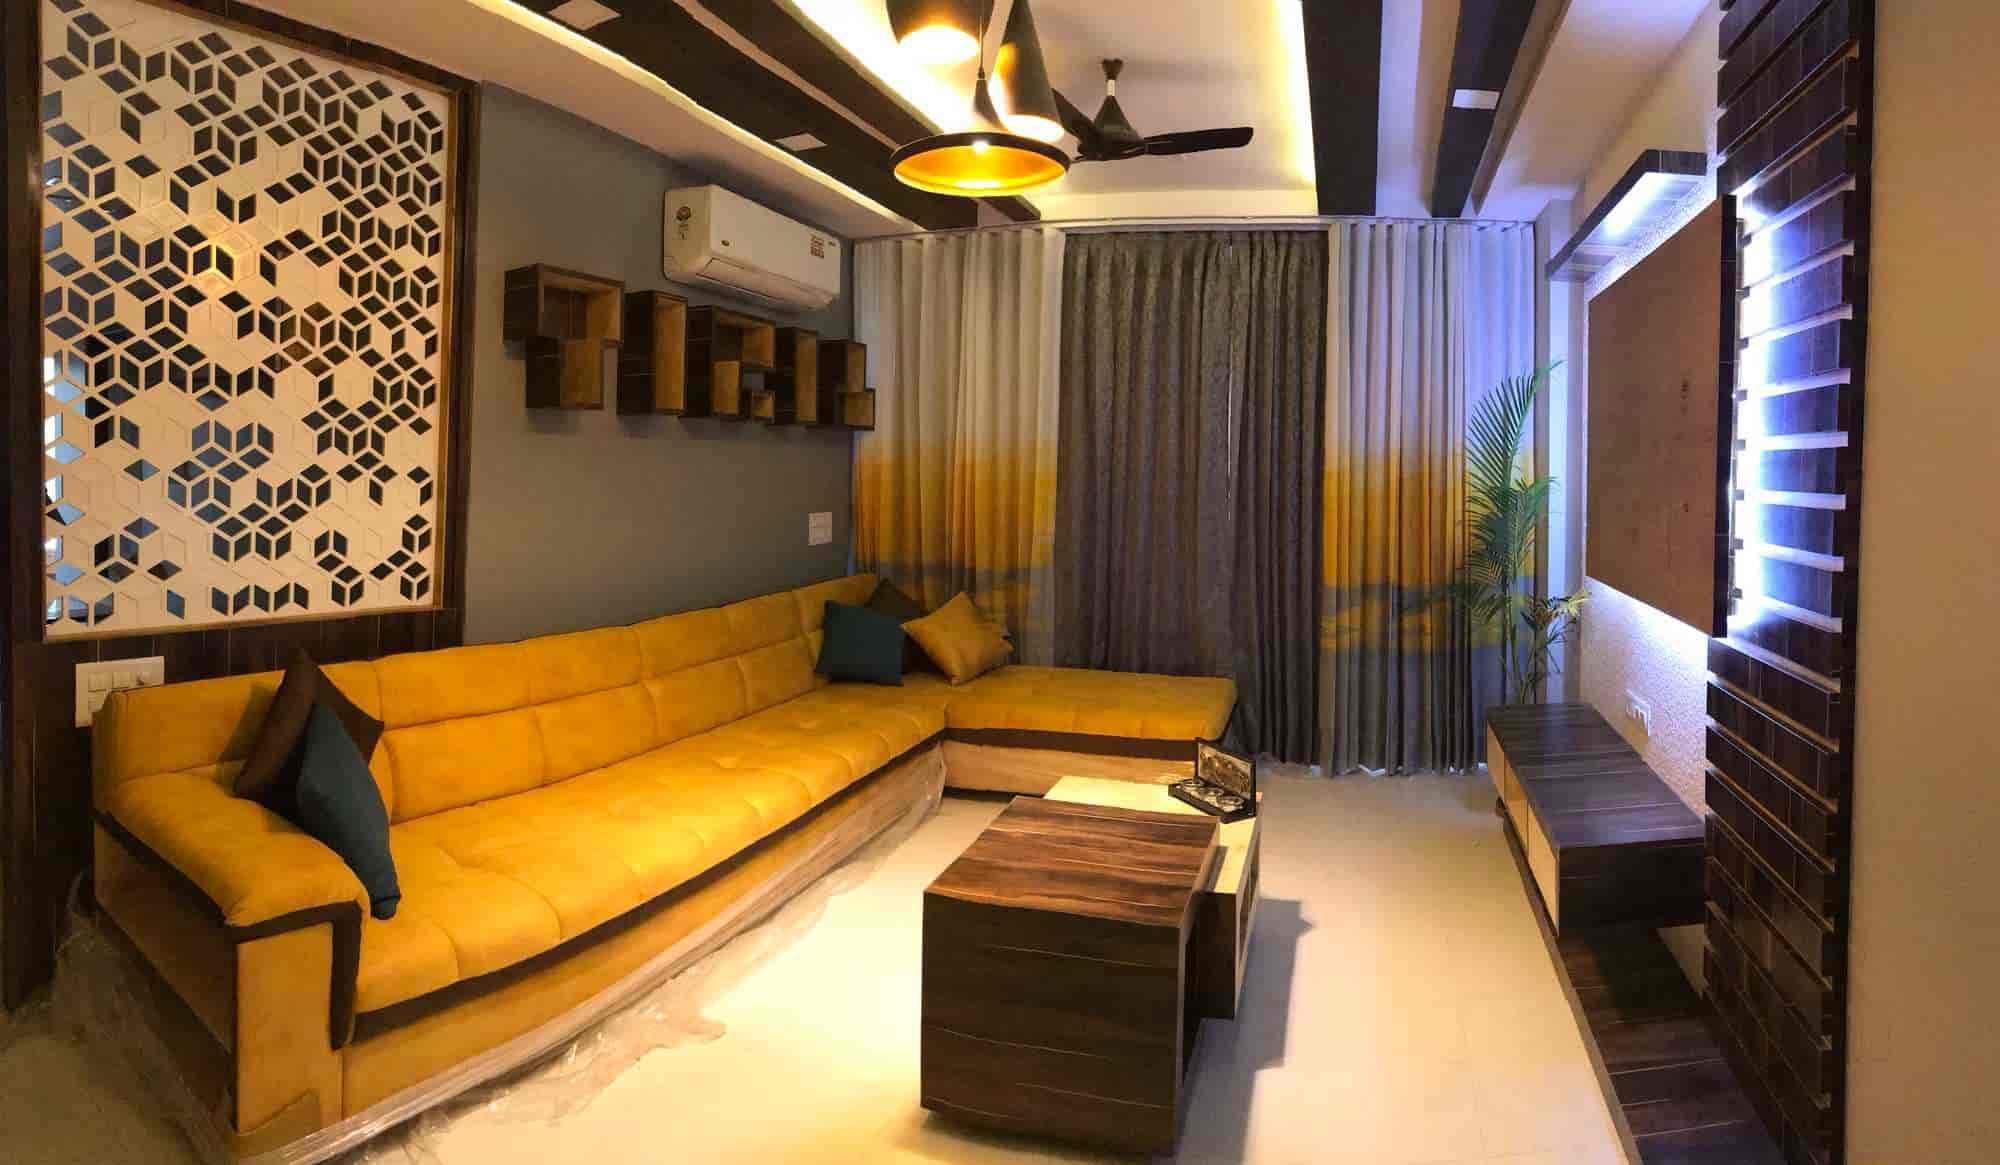 Top 20 Interior Designer Consultants In Sargasan Best Interior Designing Consultants Gandhinagar Gujarat Justdial